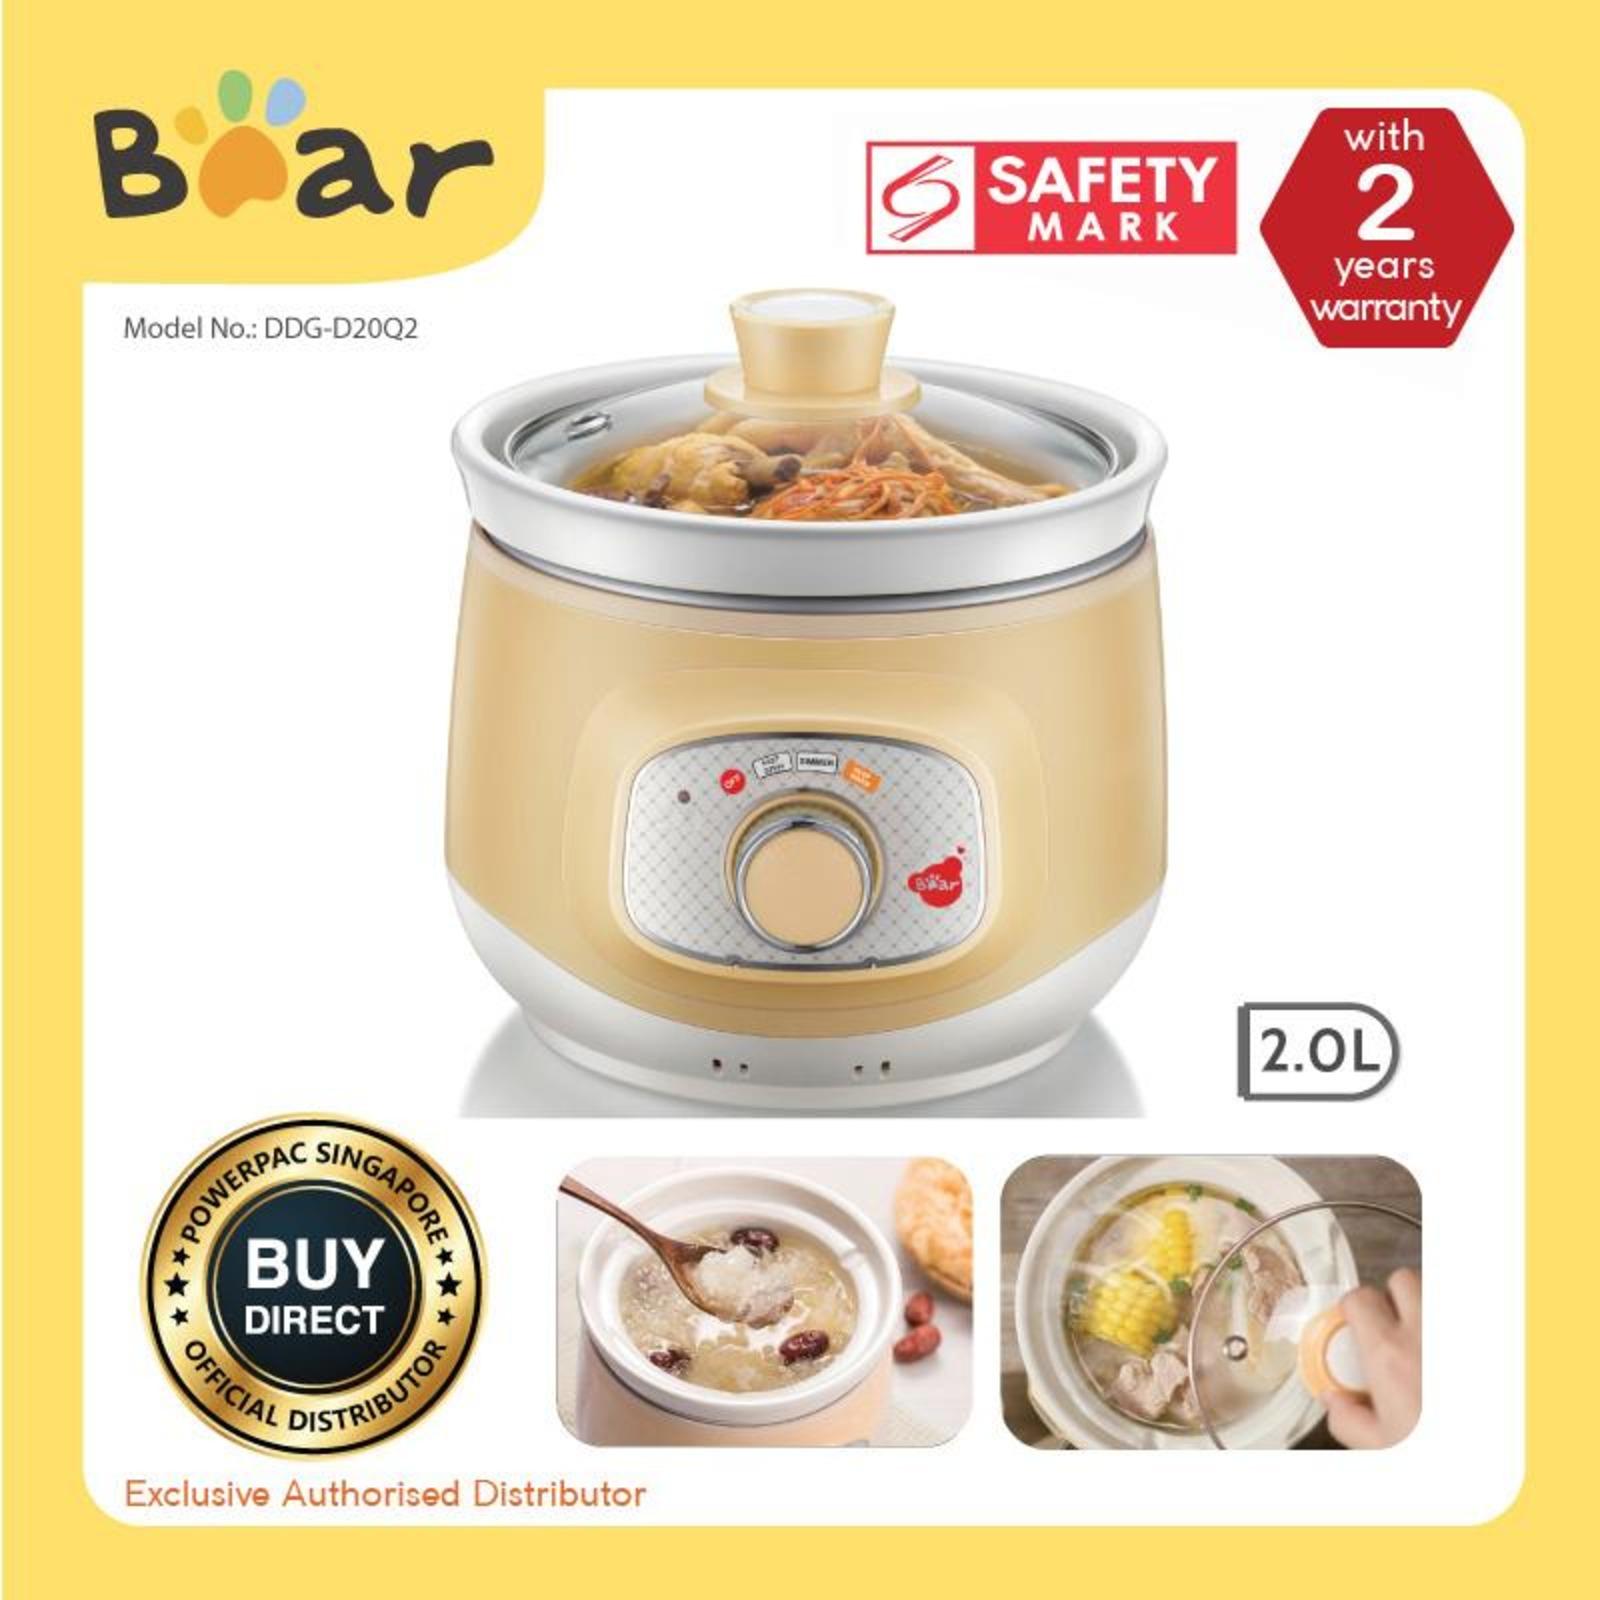 Bear Slow Cooker - Ceramic DDG-D20Q2